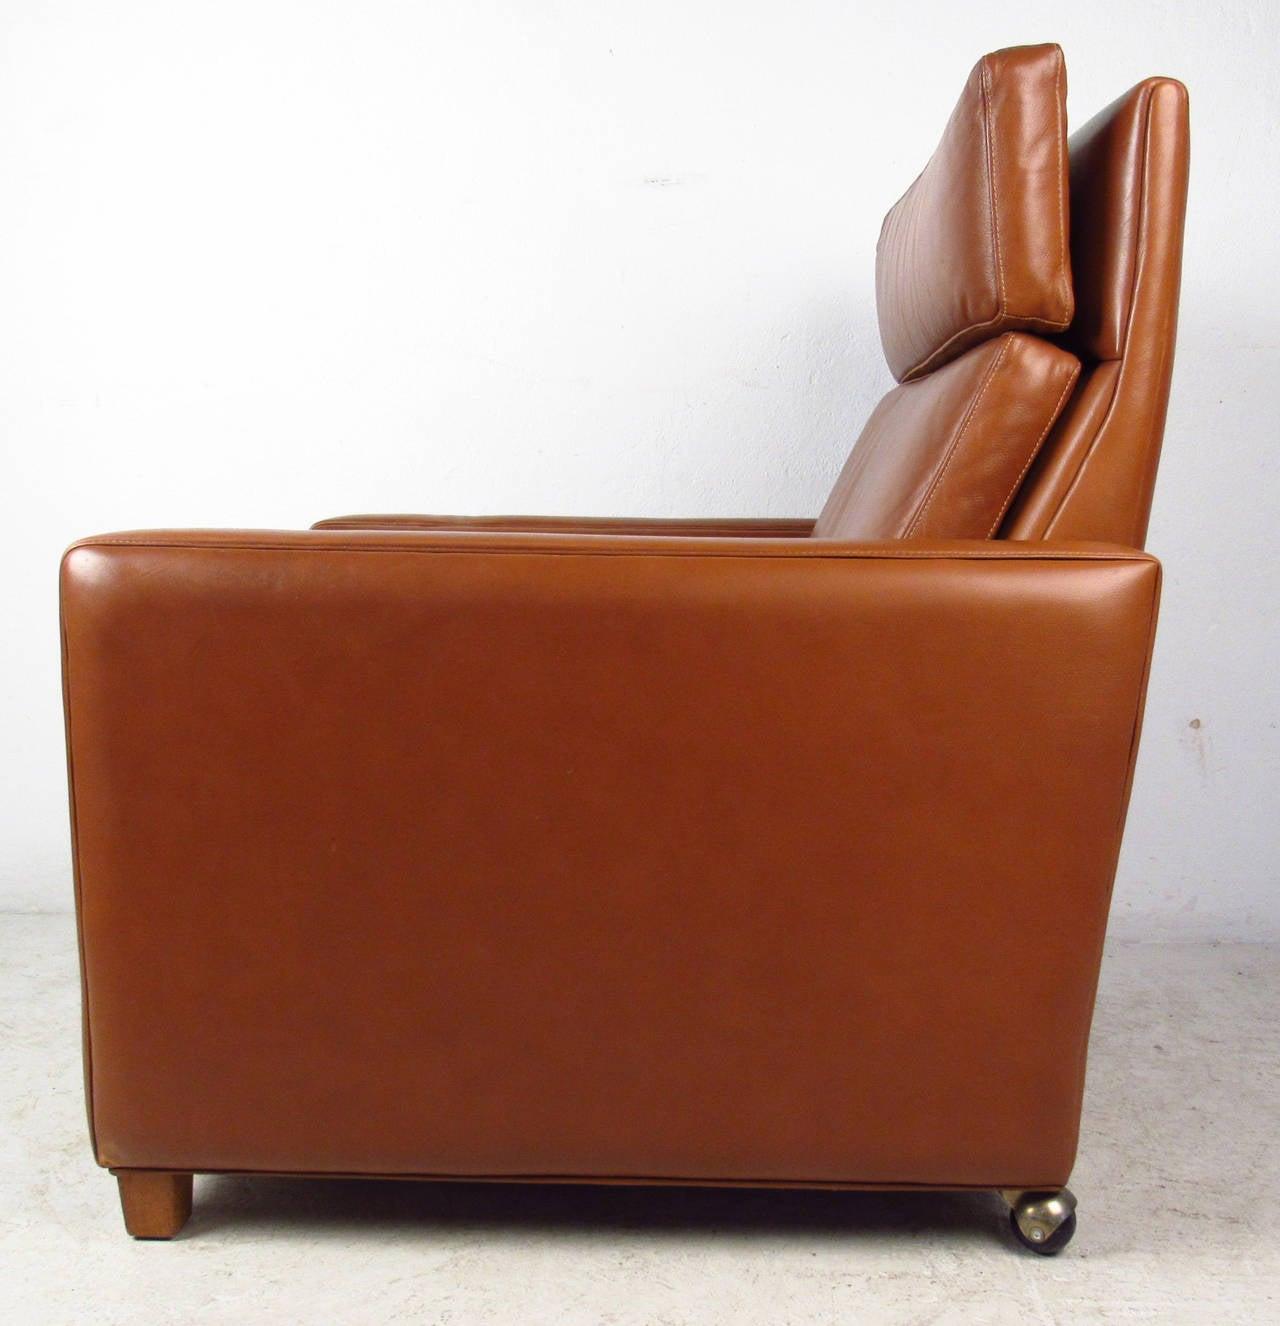 Scandinavian Modern Børge Mogensen Leather Lounge Chair For Sale